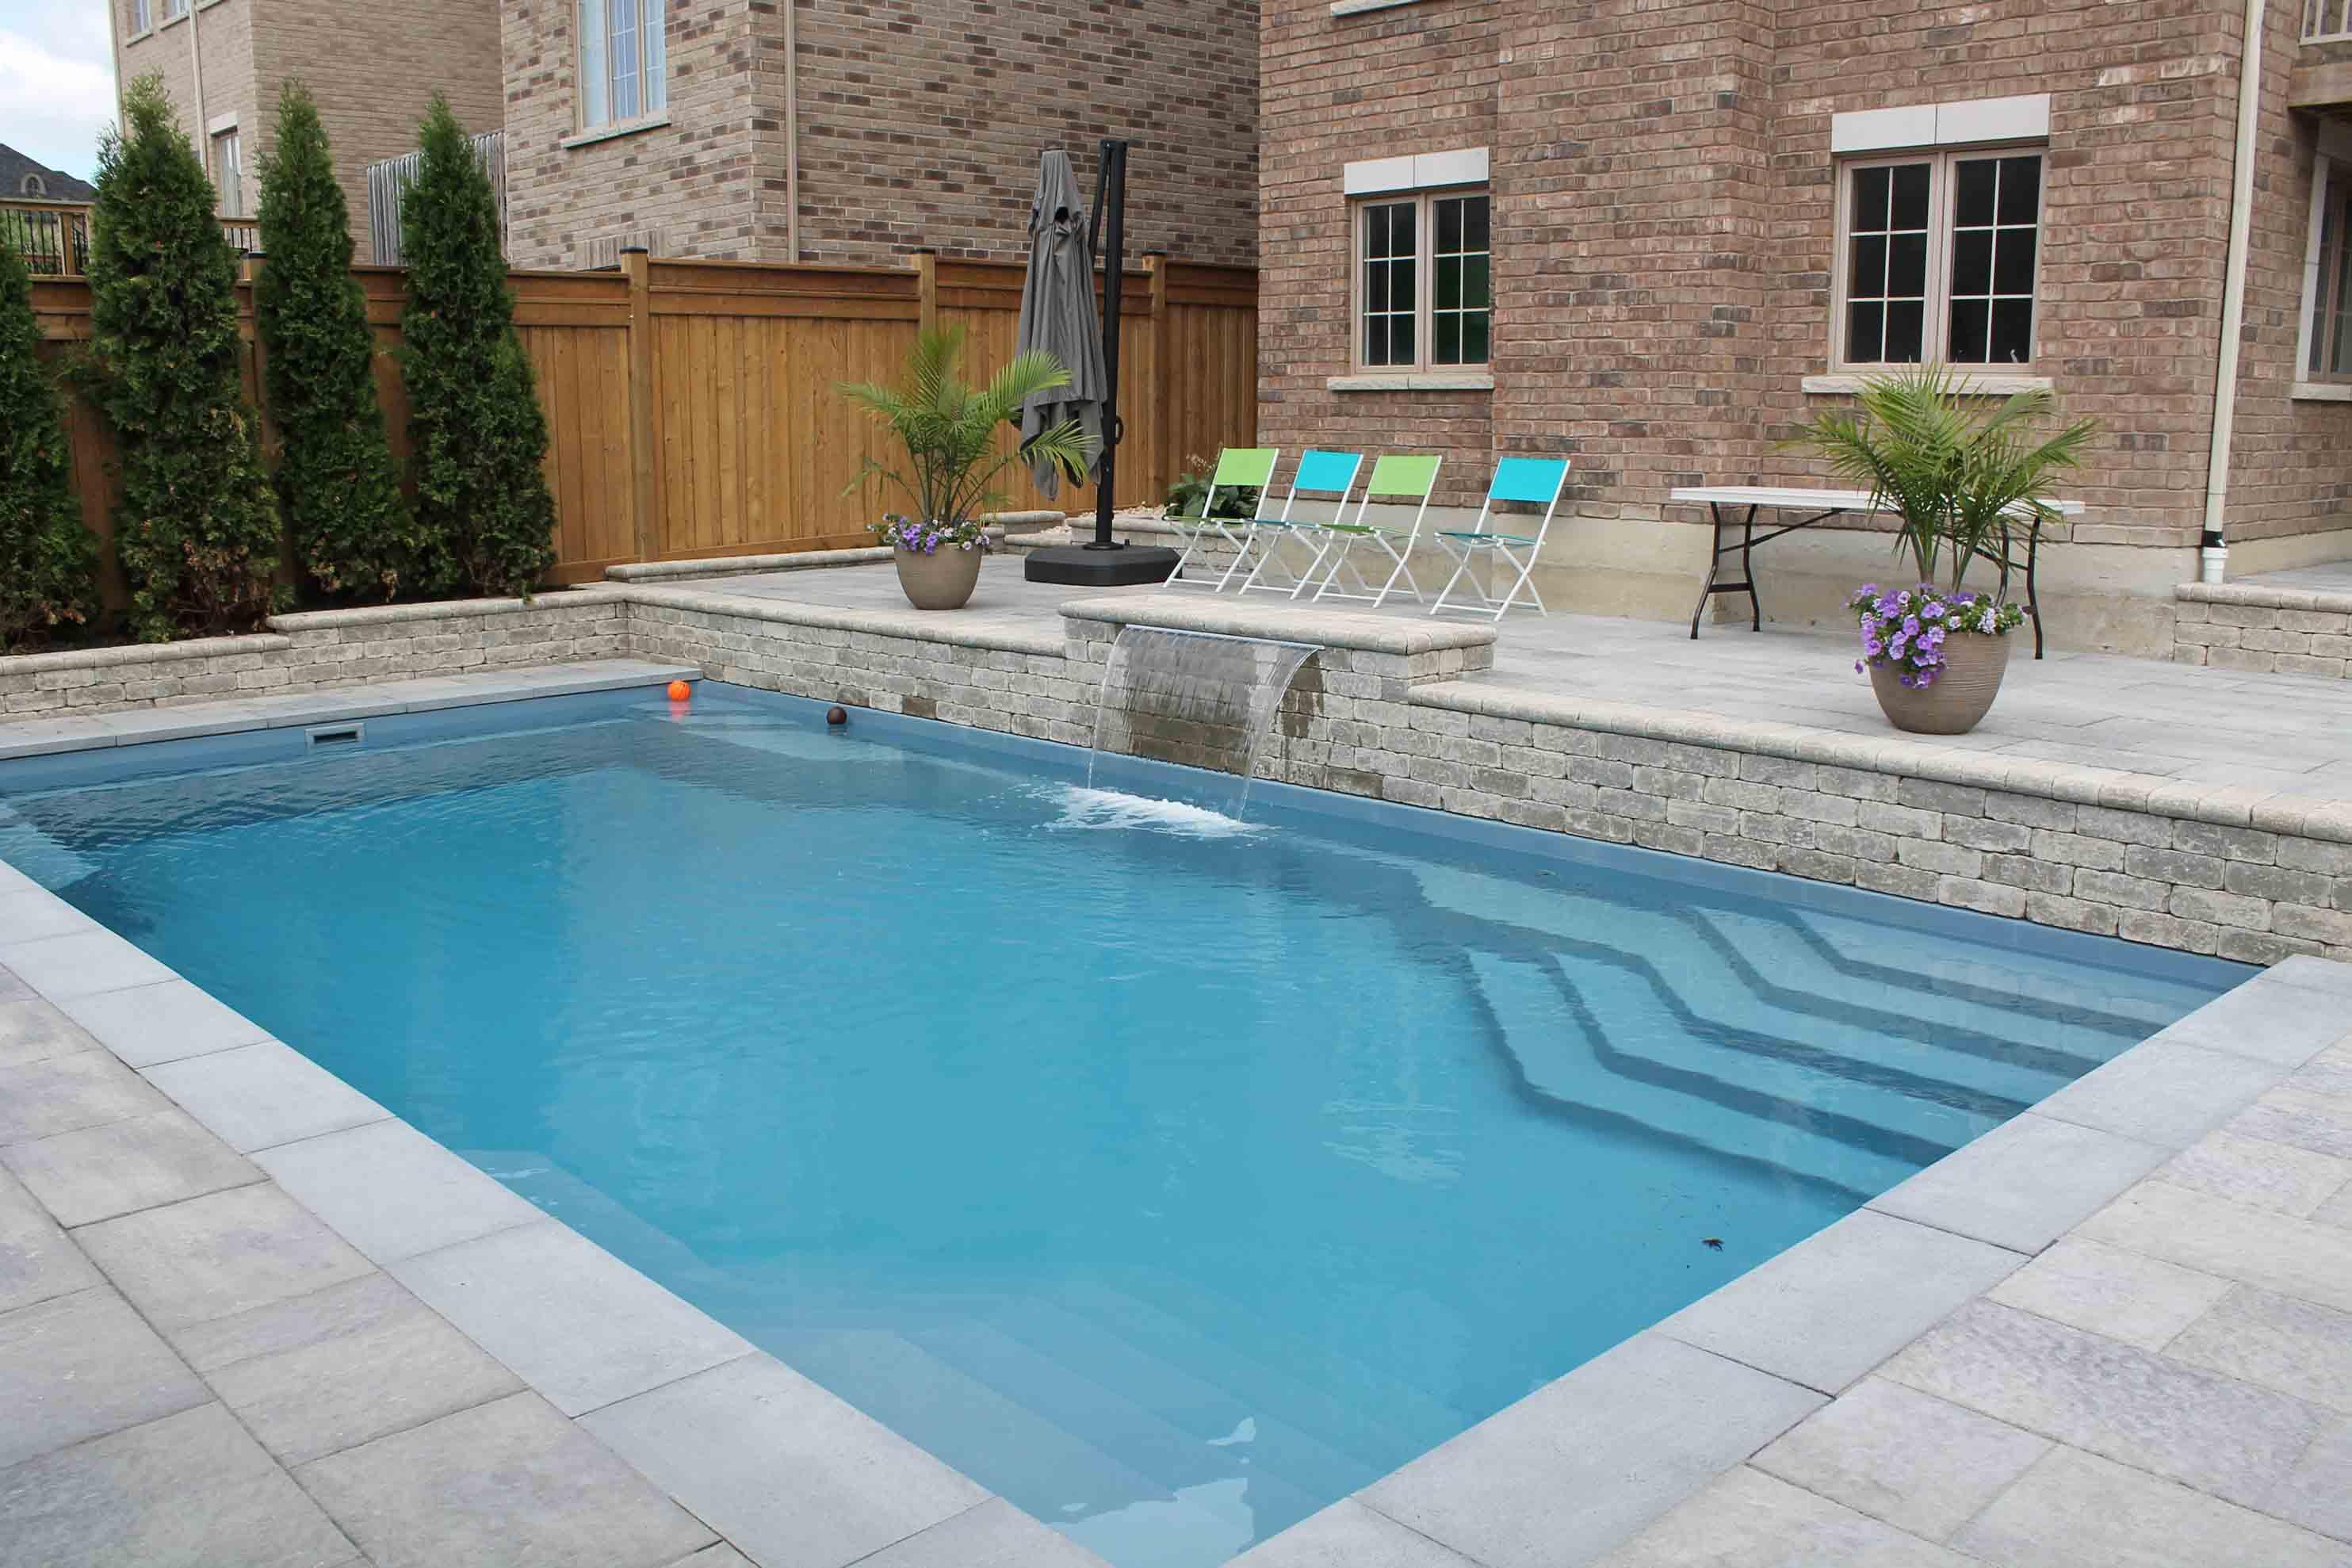 Whitby Pool Landscape Installation Fiberglass Inground